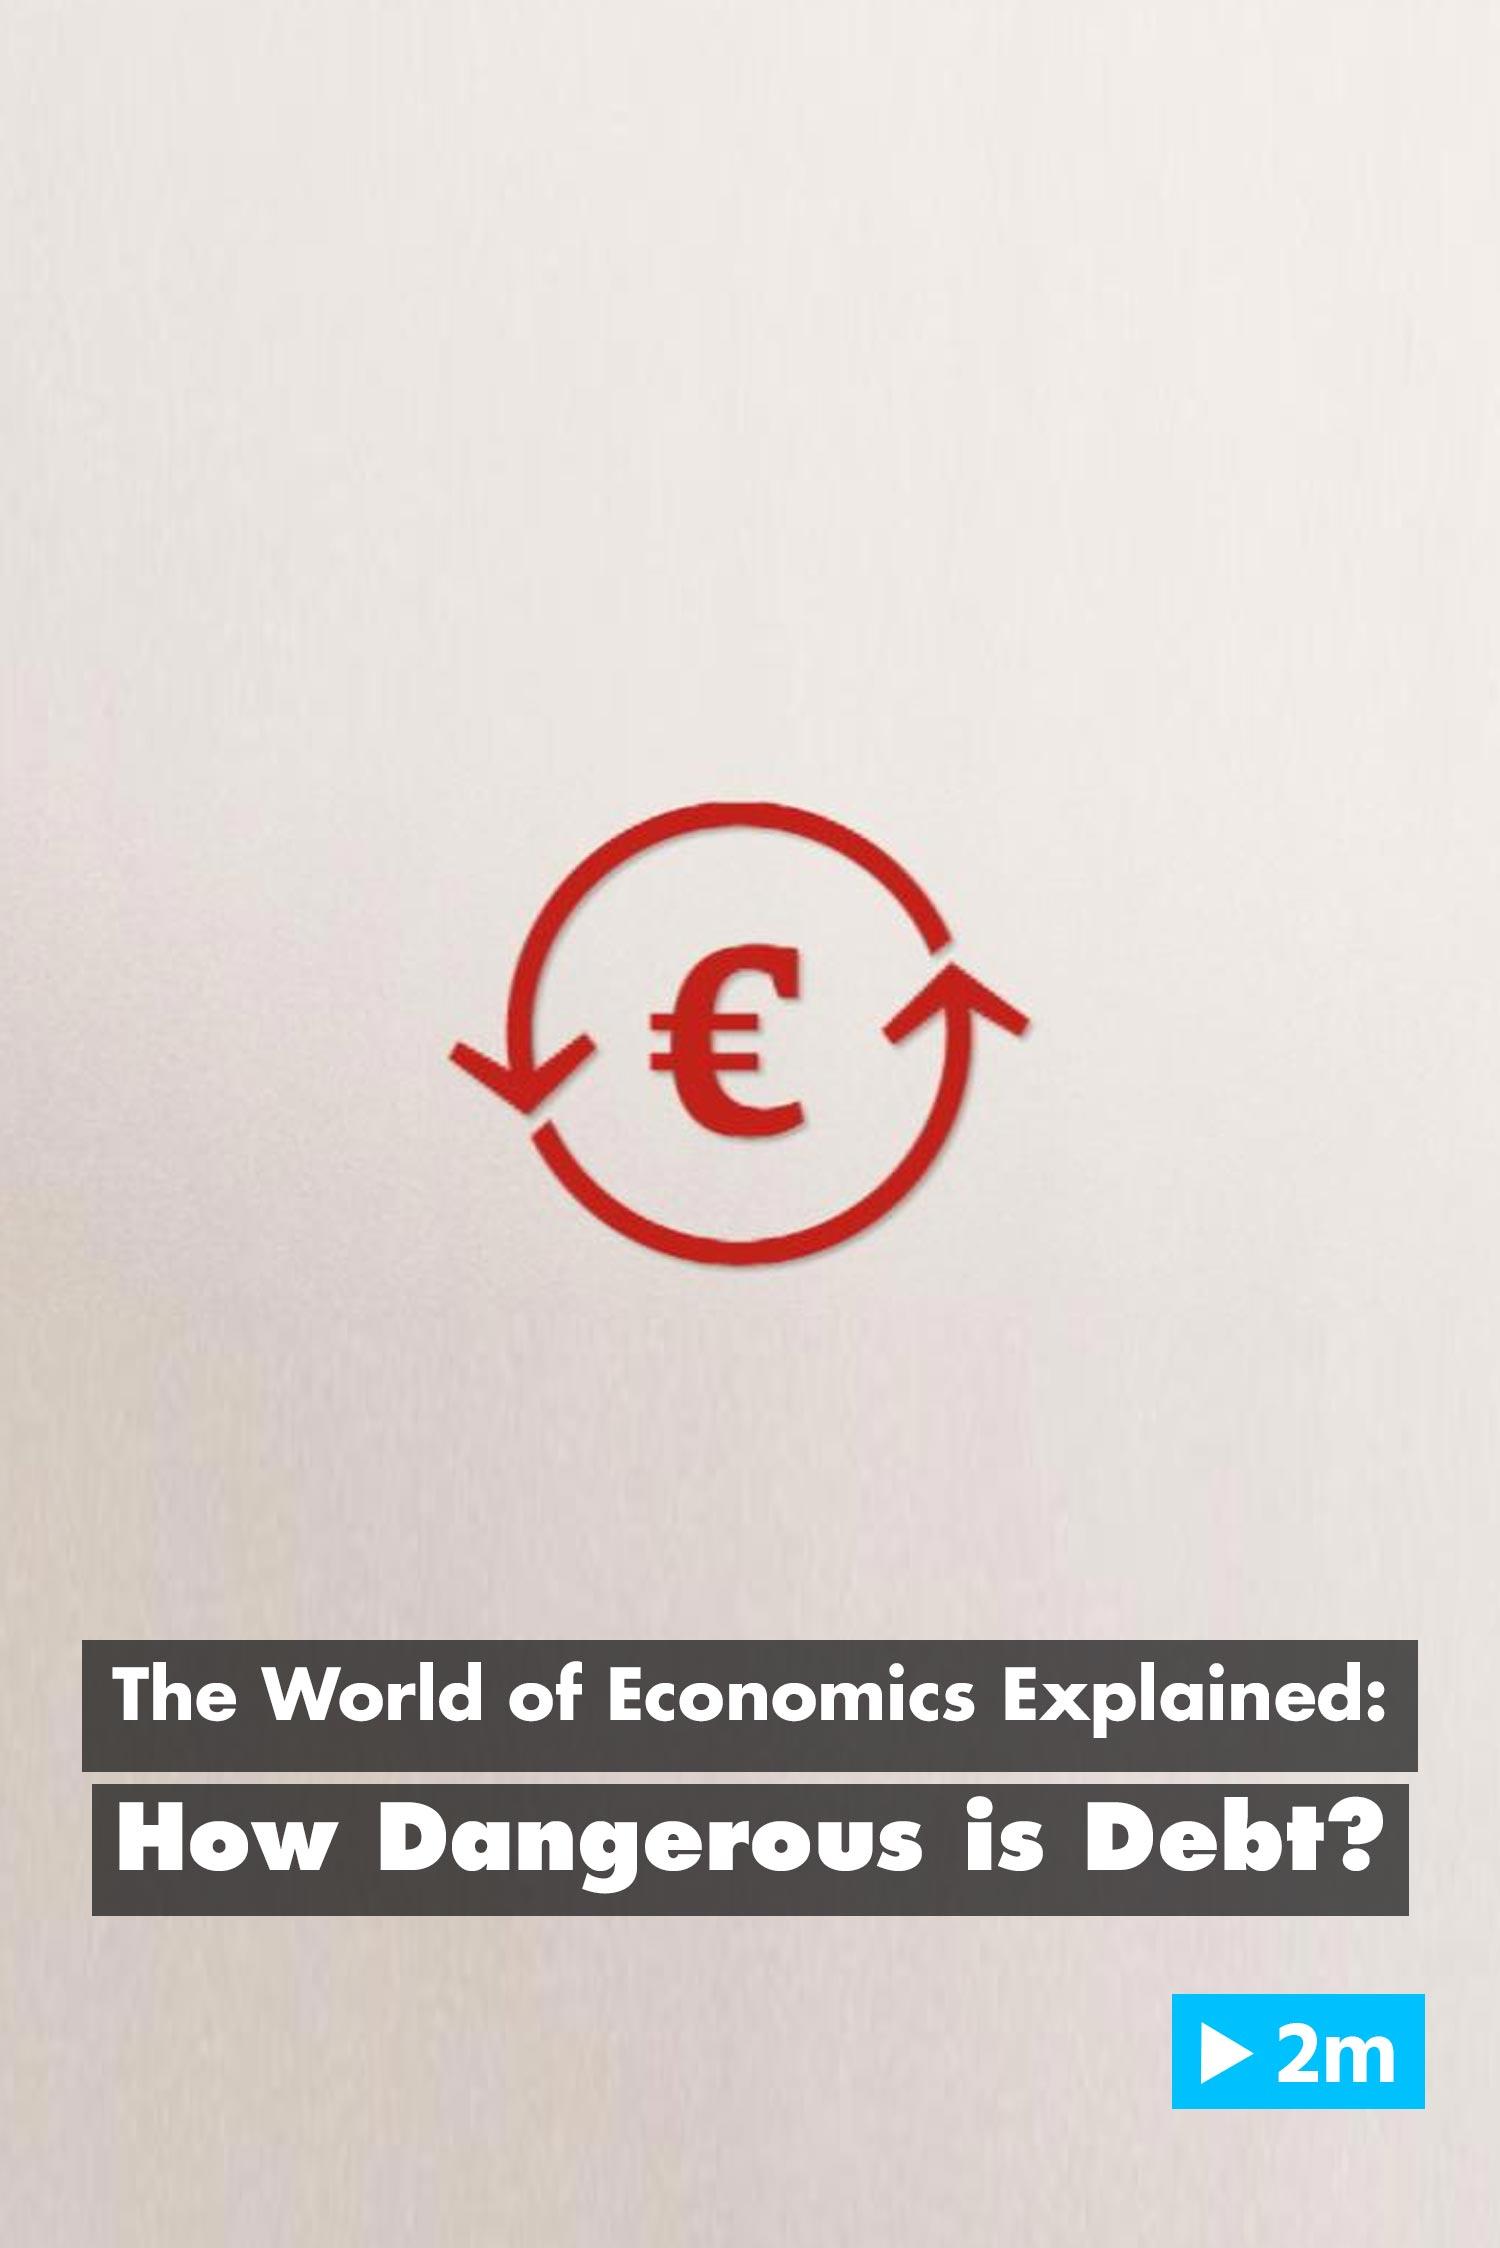 The World of Economics Explained: How dangerous is debt?